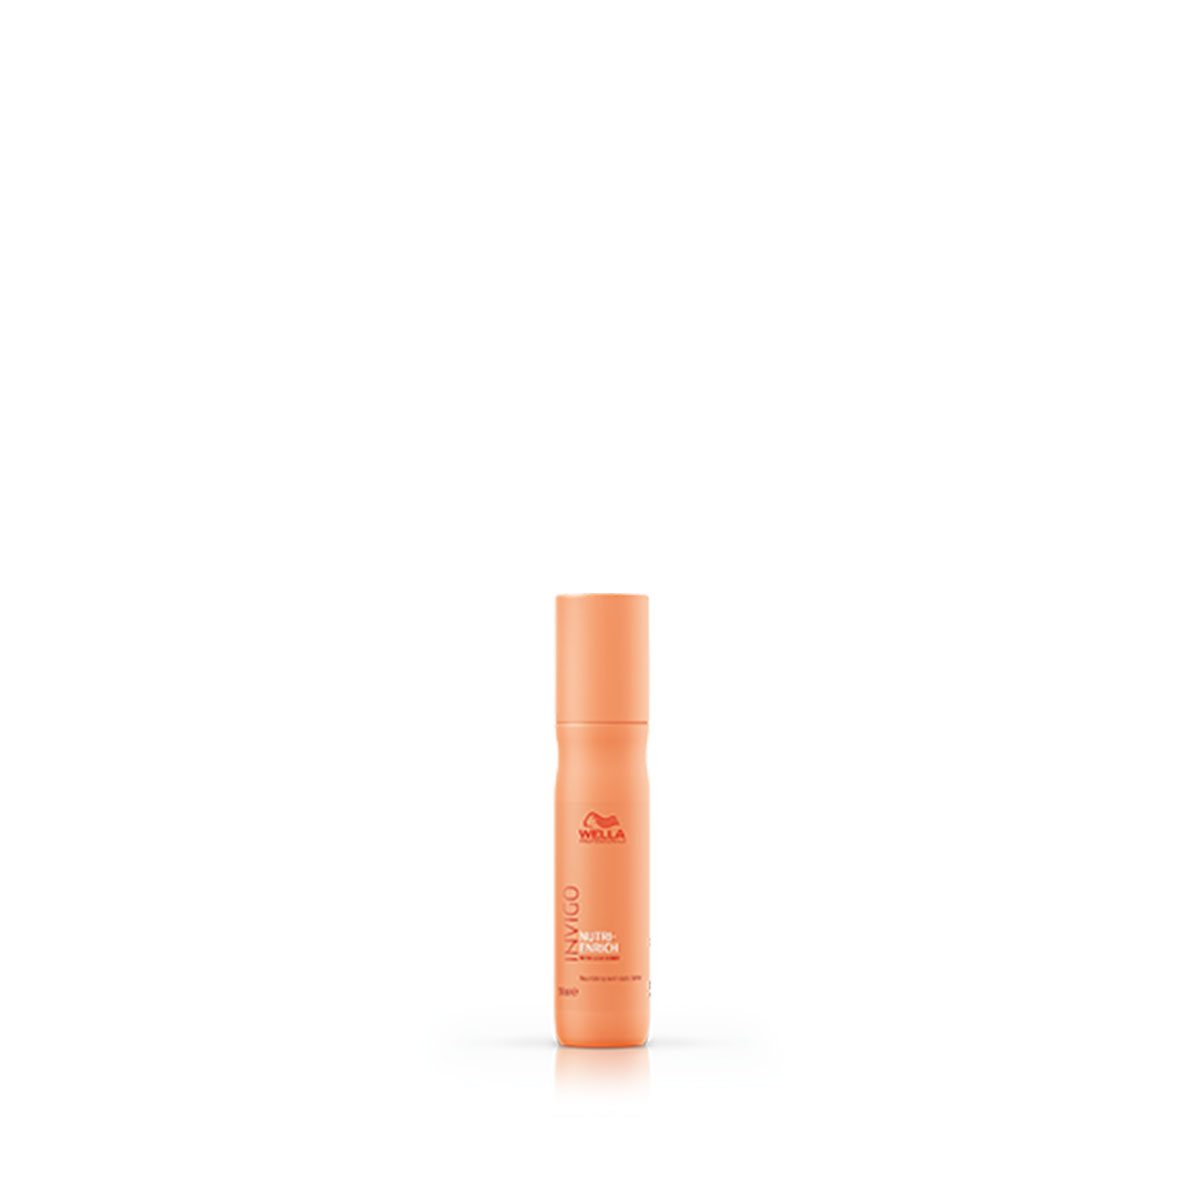 Nutri-enrich Spray Anti Static 150ml